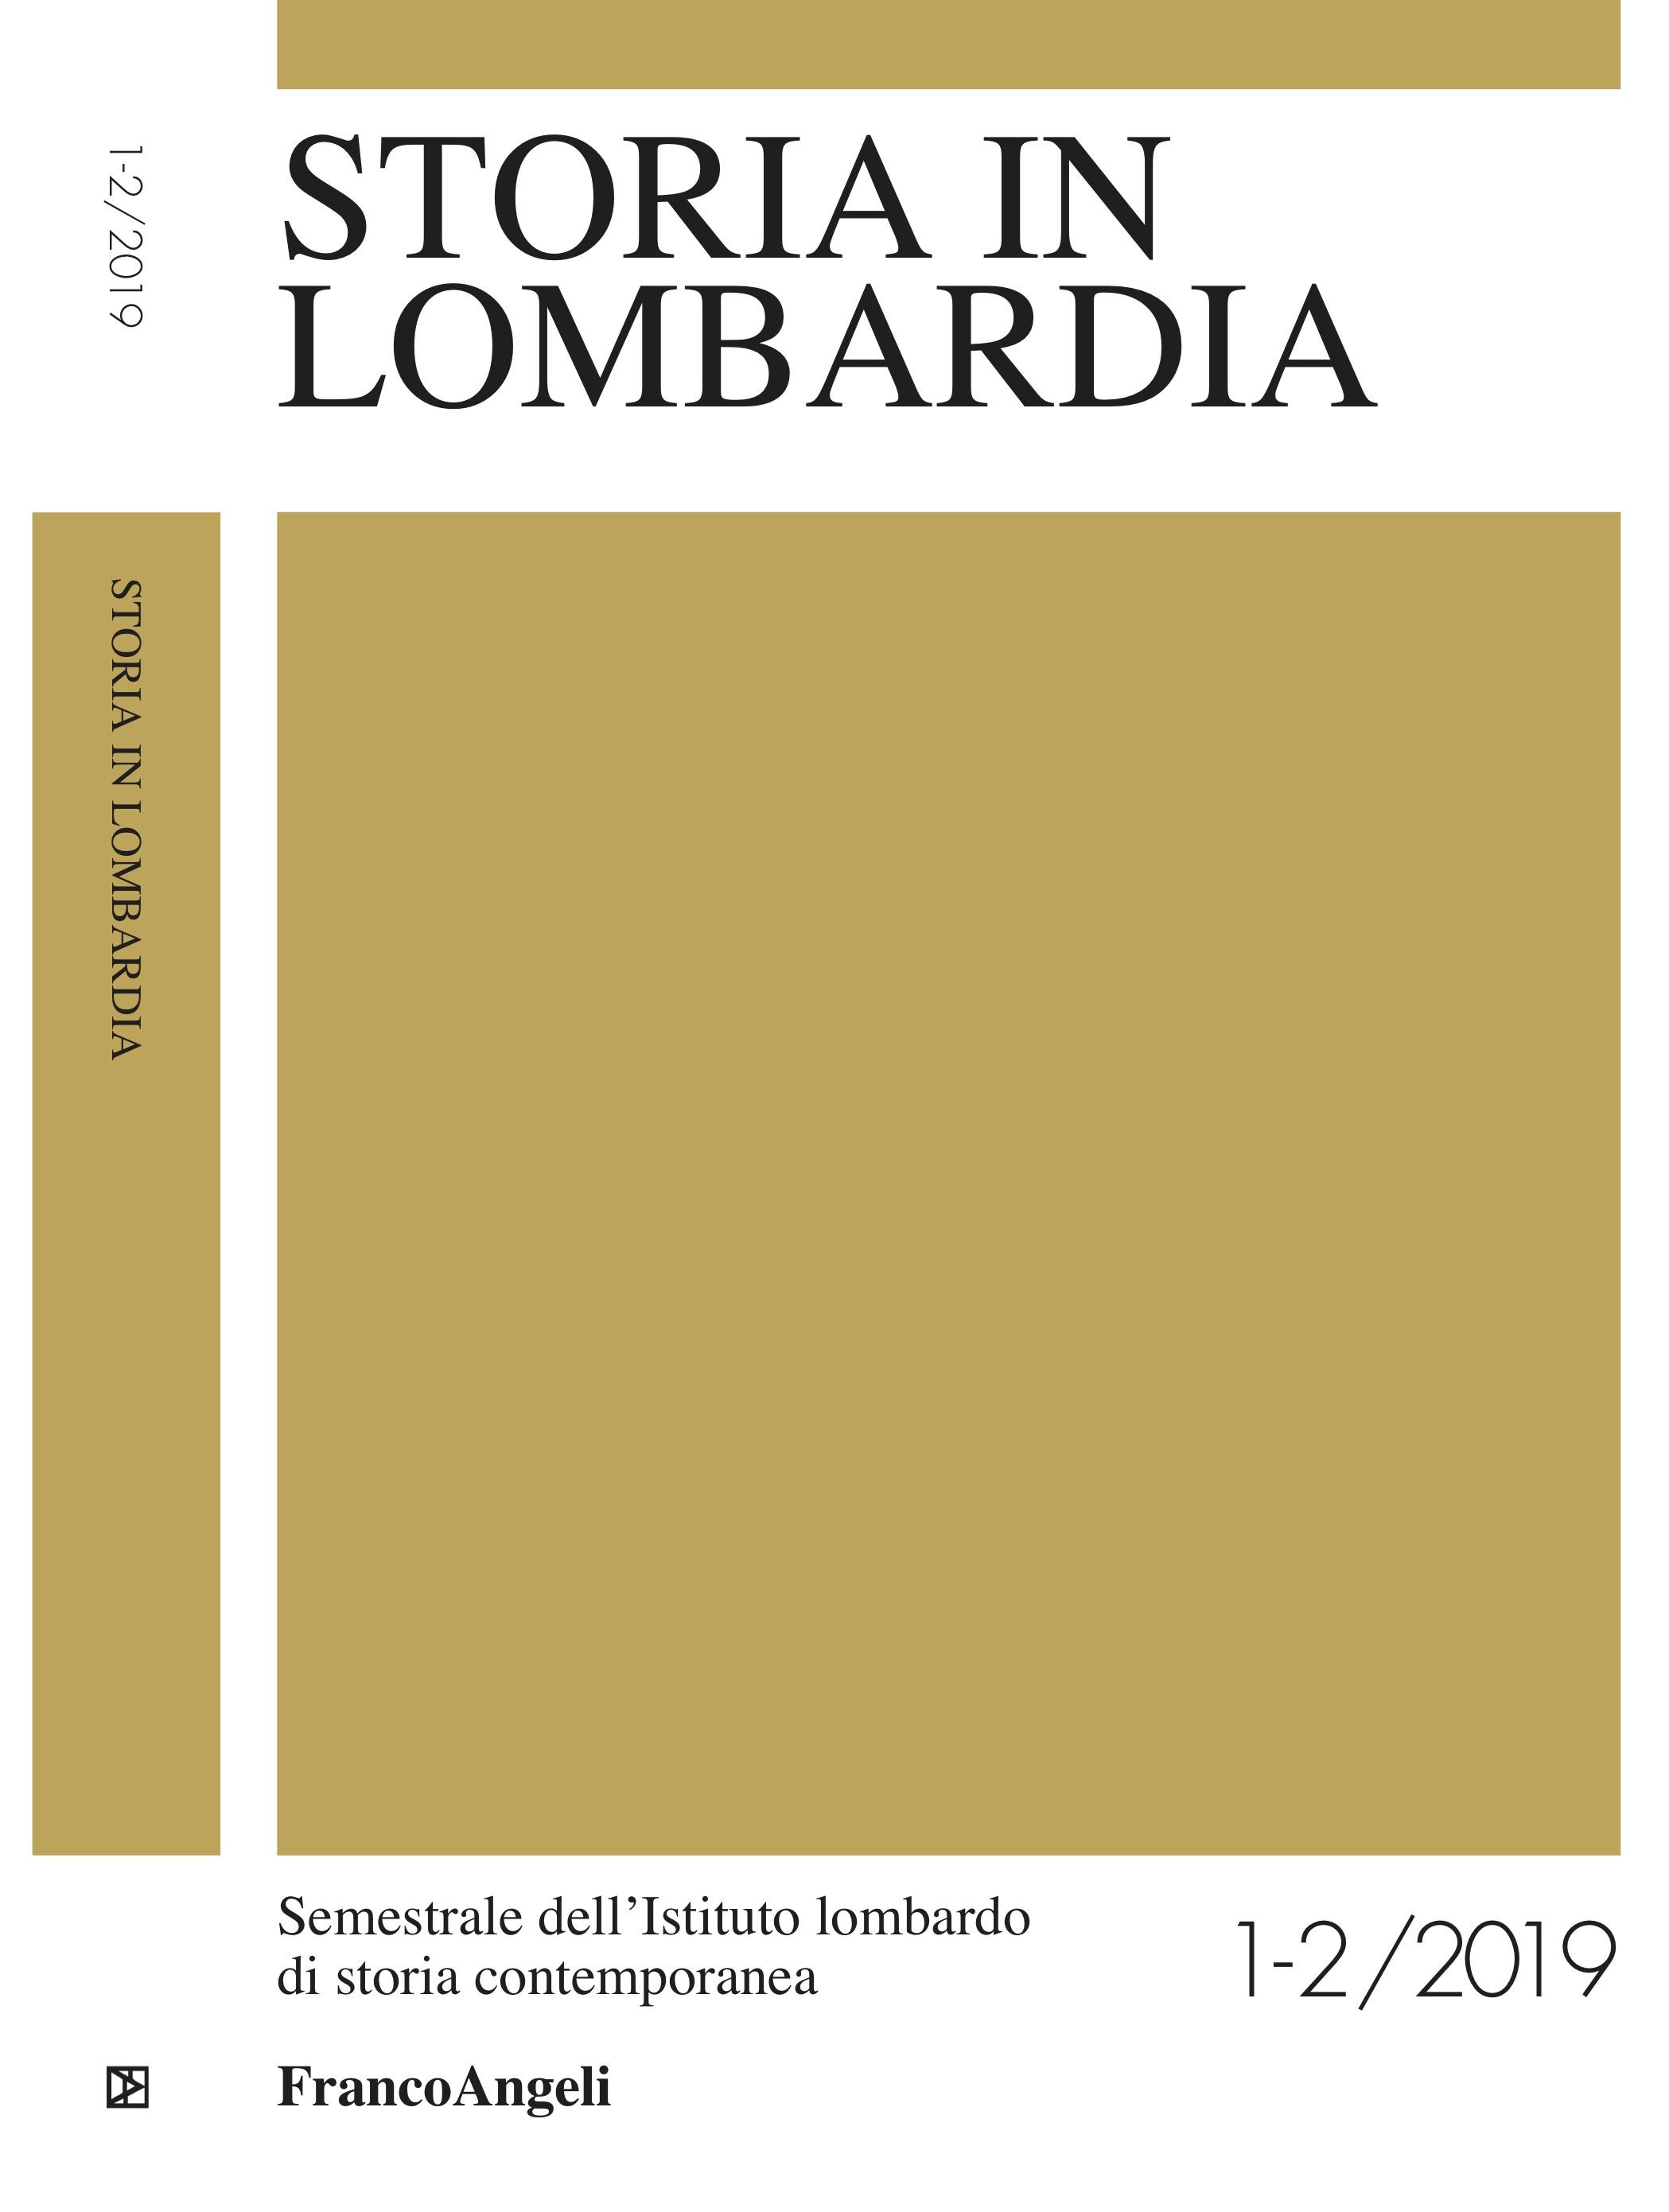 StoriaLombardia 1-2-19_Copertina